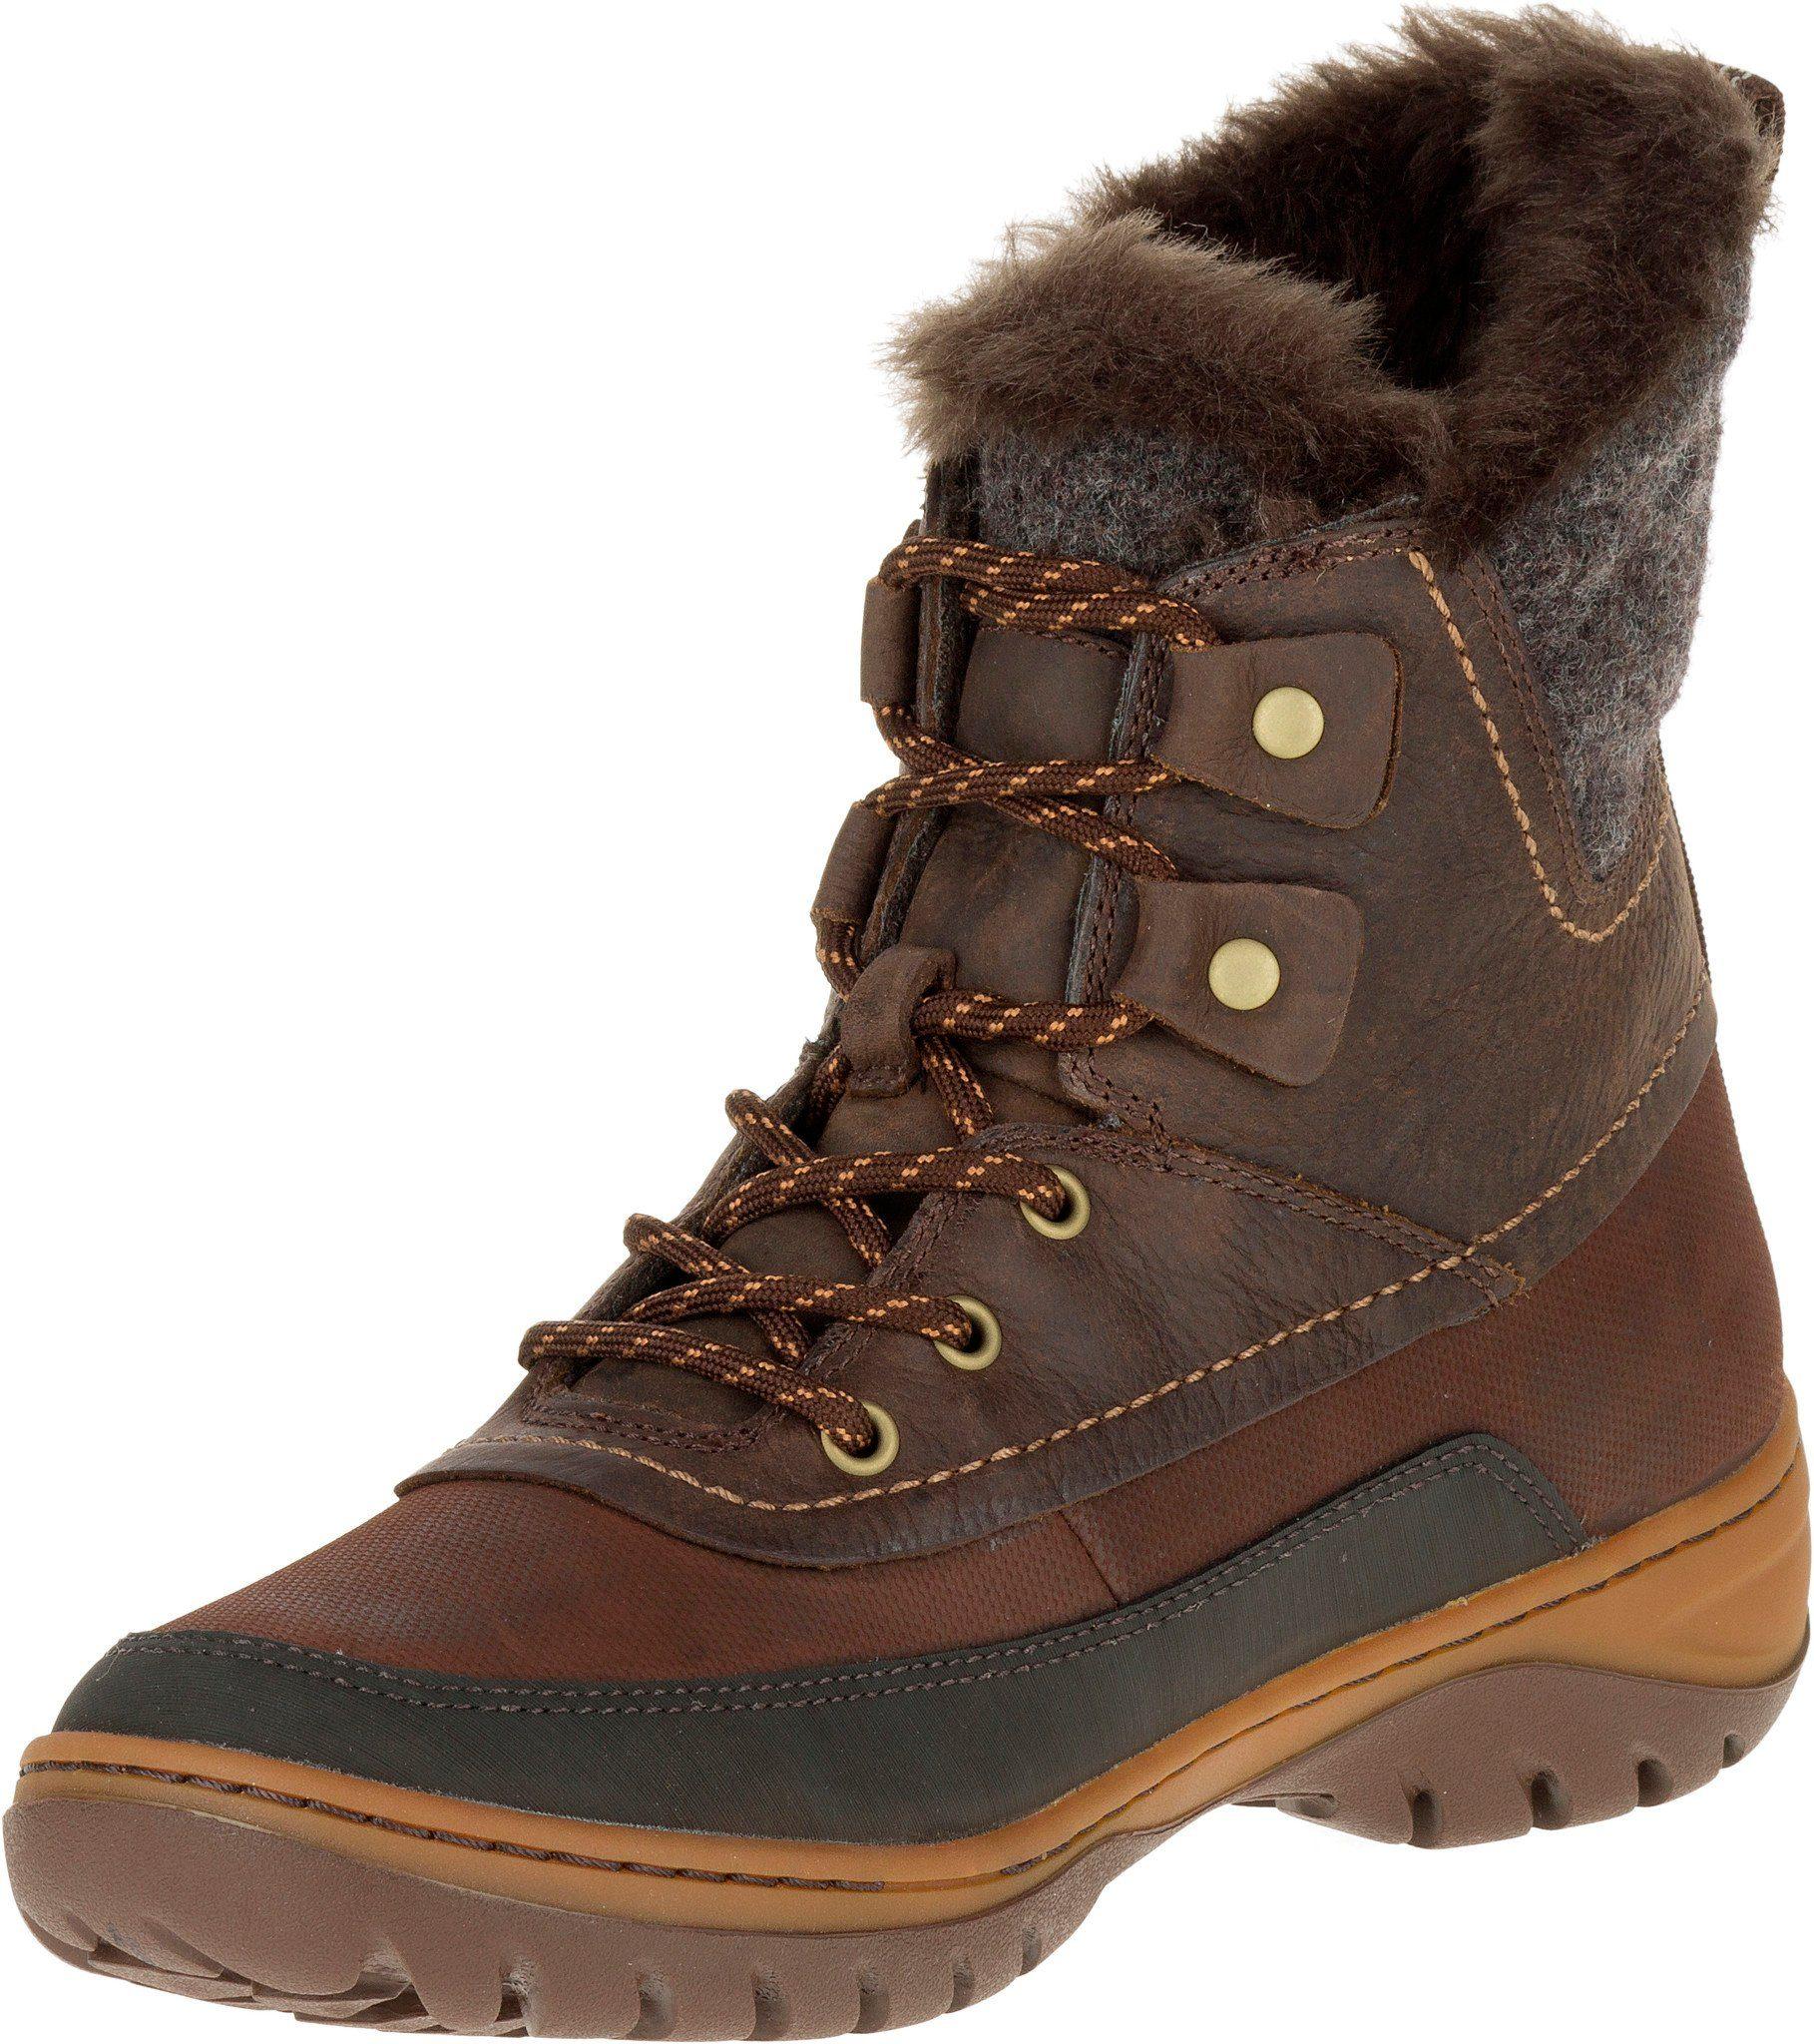 Merrell Freizeitschuh »Sylva Mid Lace Waterproof Boots Women«